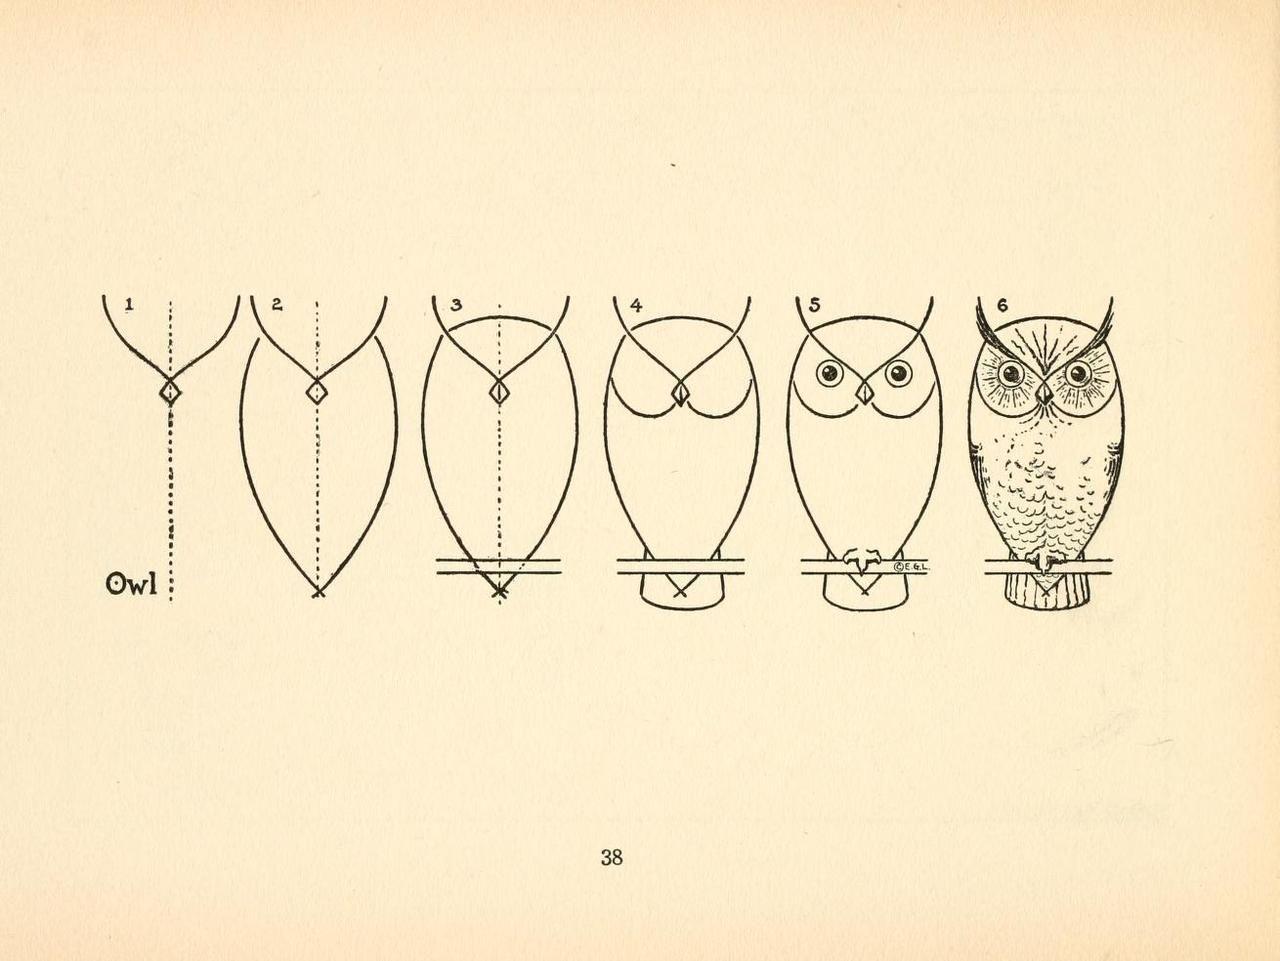 1280x961 E.g. Lutz, What To Draw And How To Draw It, 1913 Art